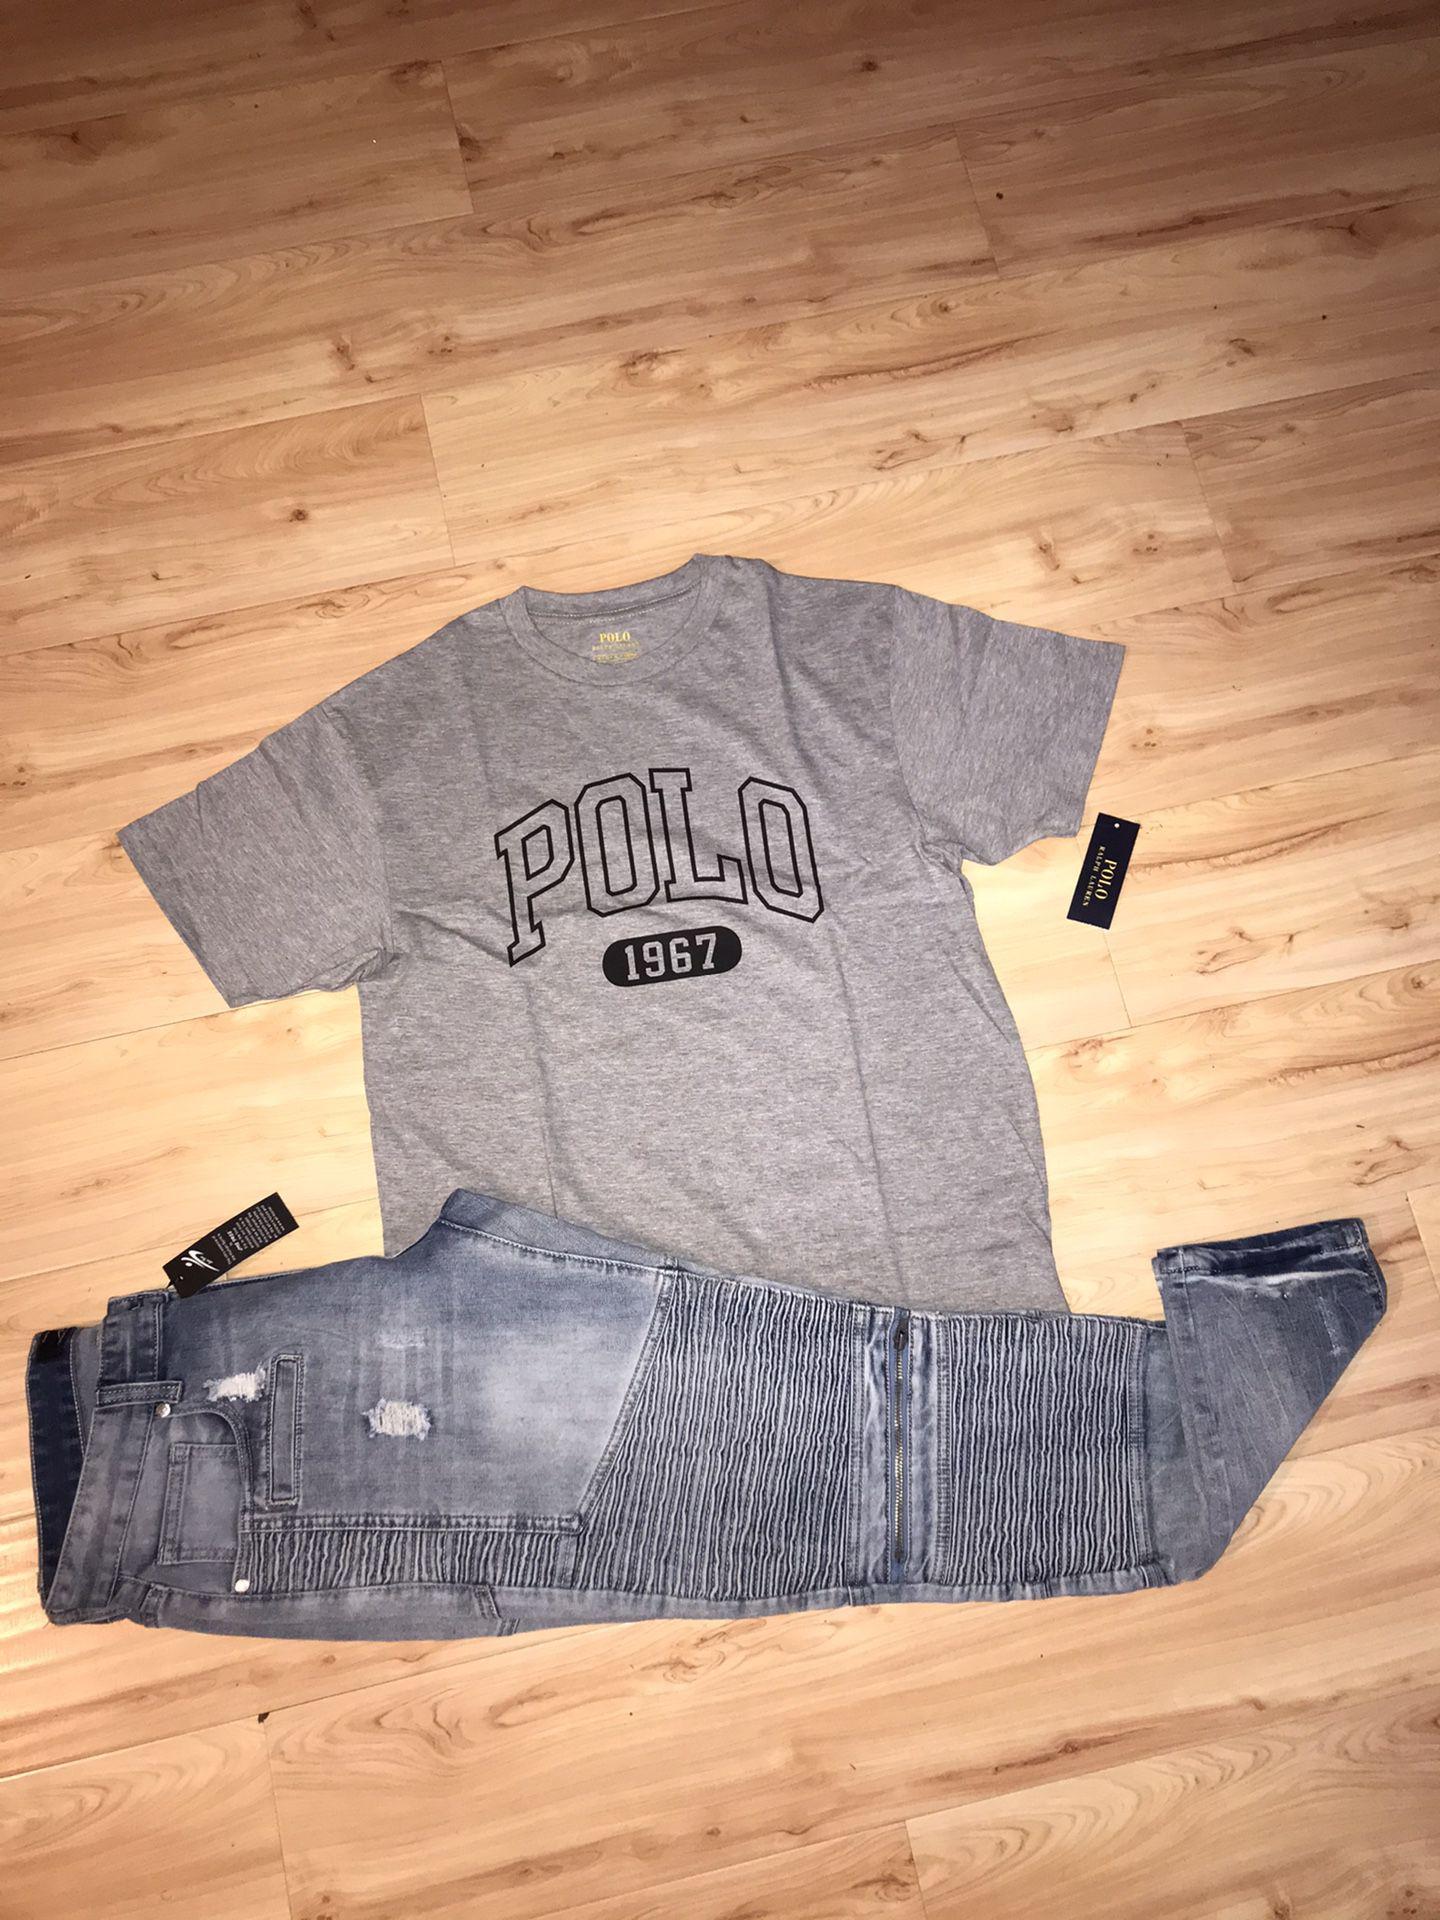 Brand new premium denim jeans